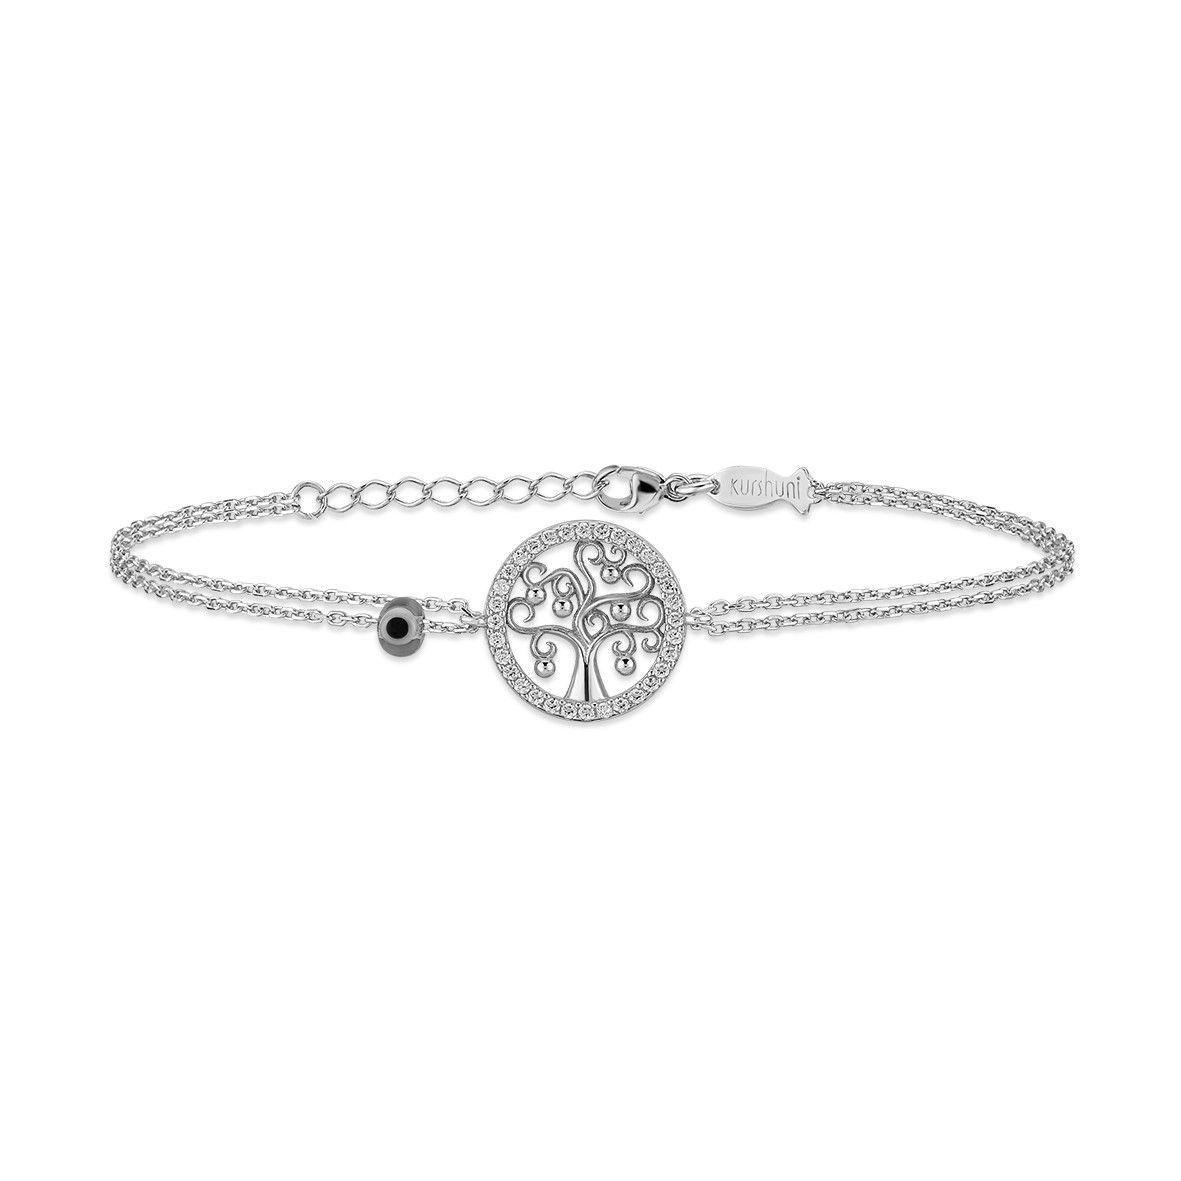 Tree of life, sterling silver bracelet Silver Kurshuni